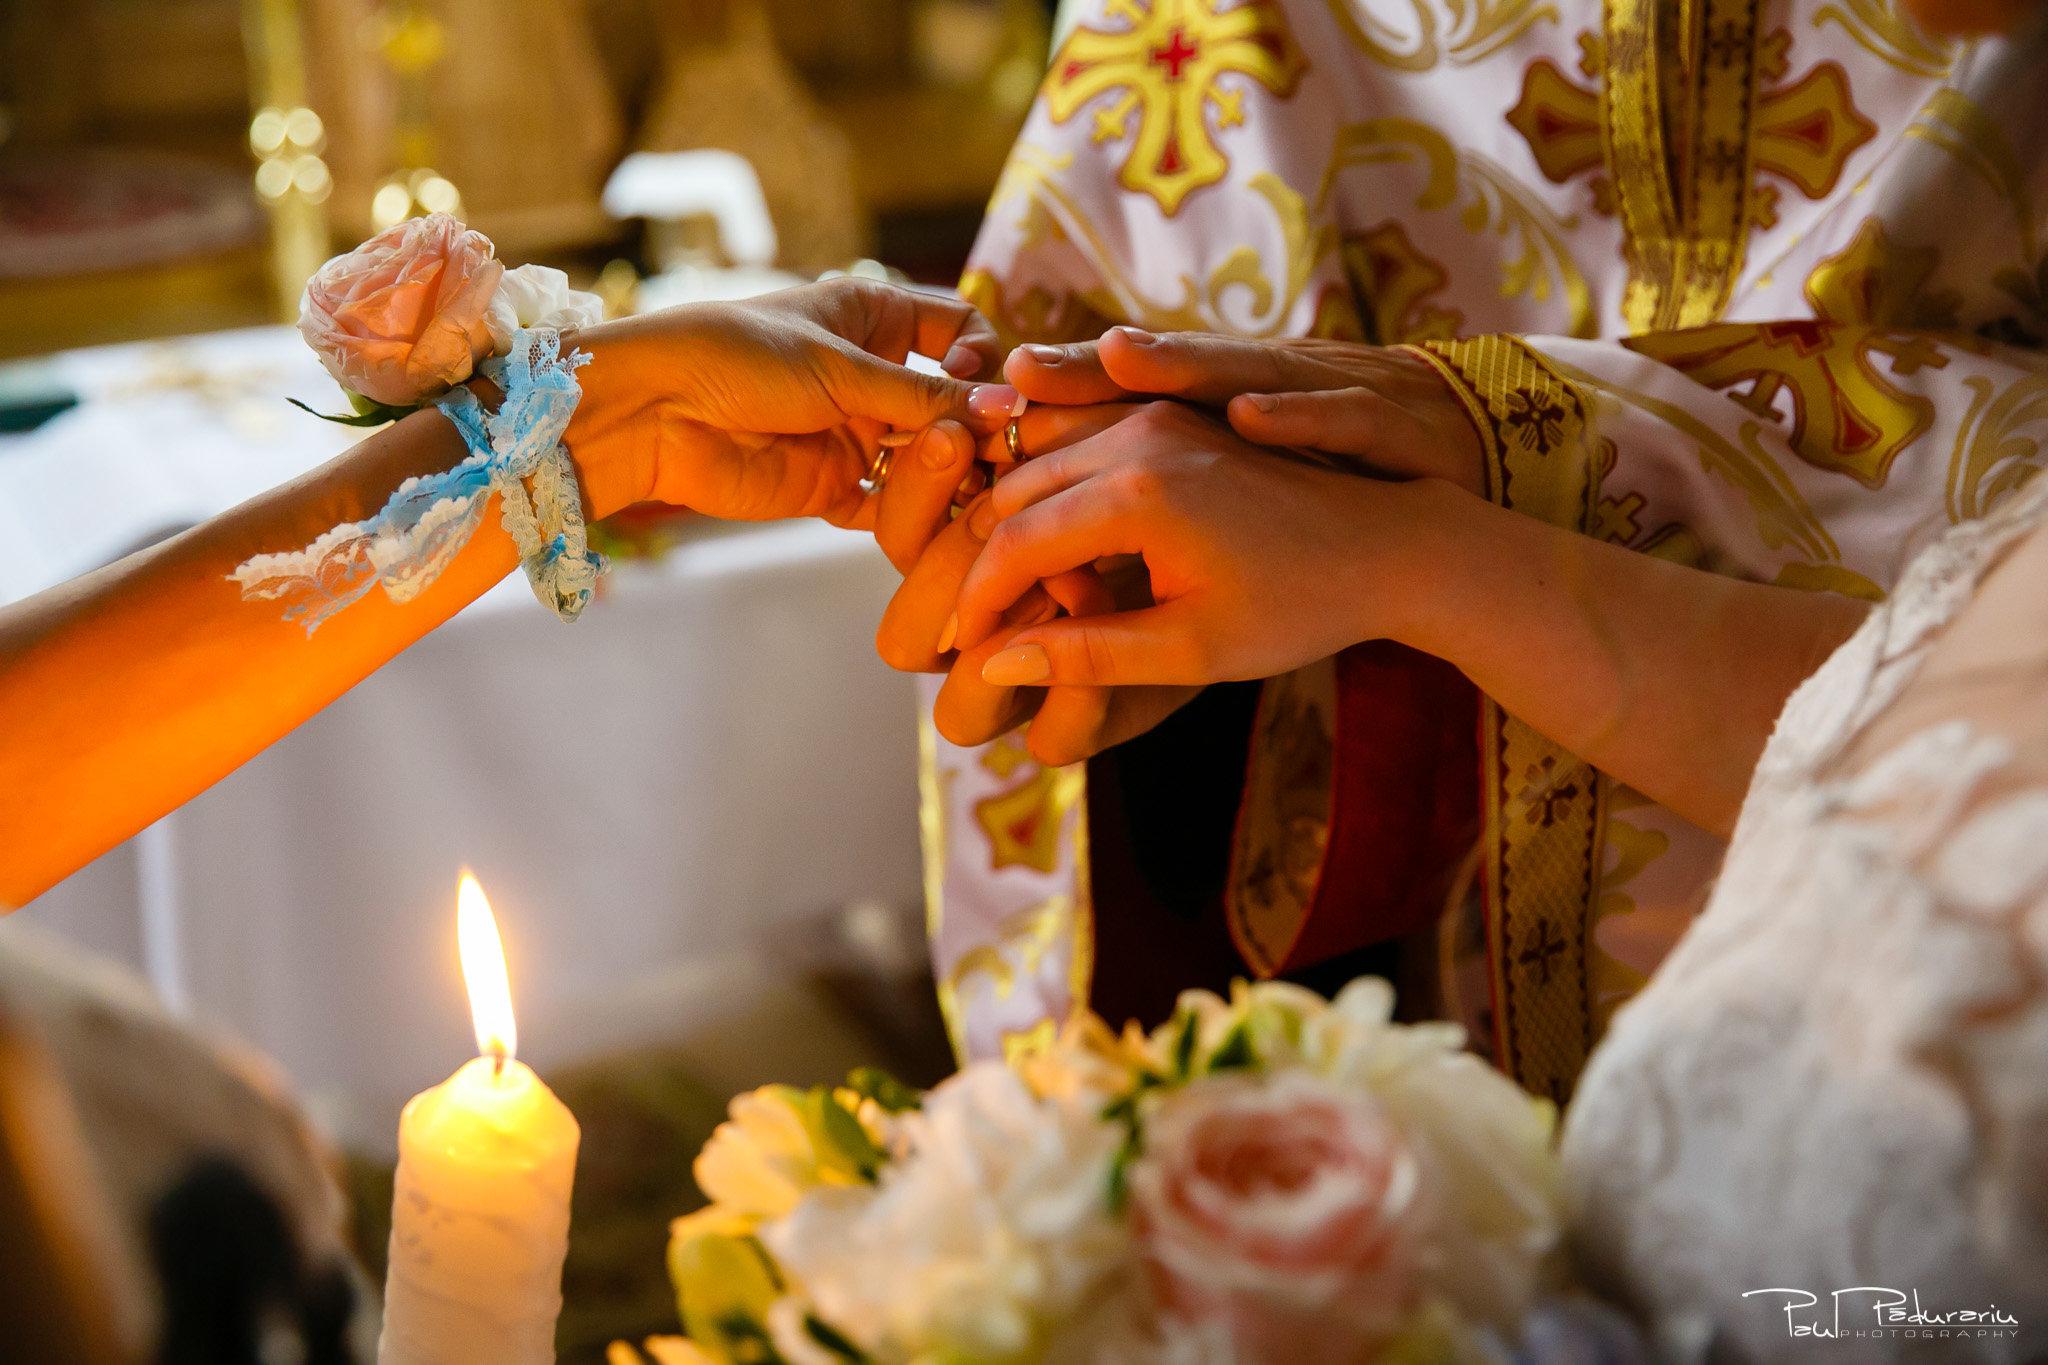 Adriana si Iulian moment verighte cununie religioasa - fotograf profesionist Iasi www.paulpadurariu.ro © 2017 Paul Padurariu